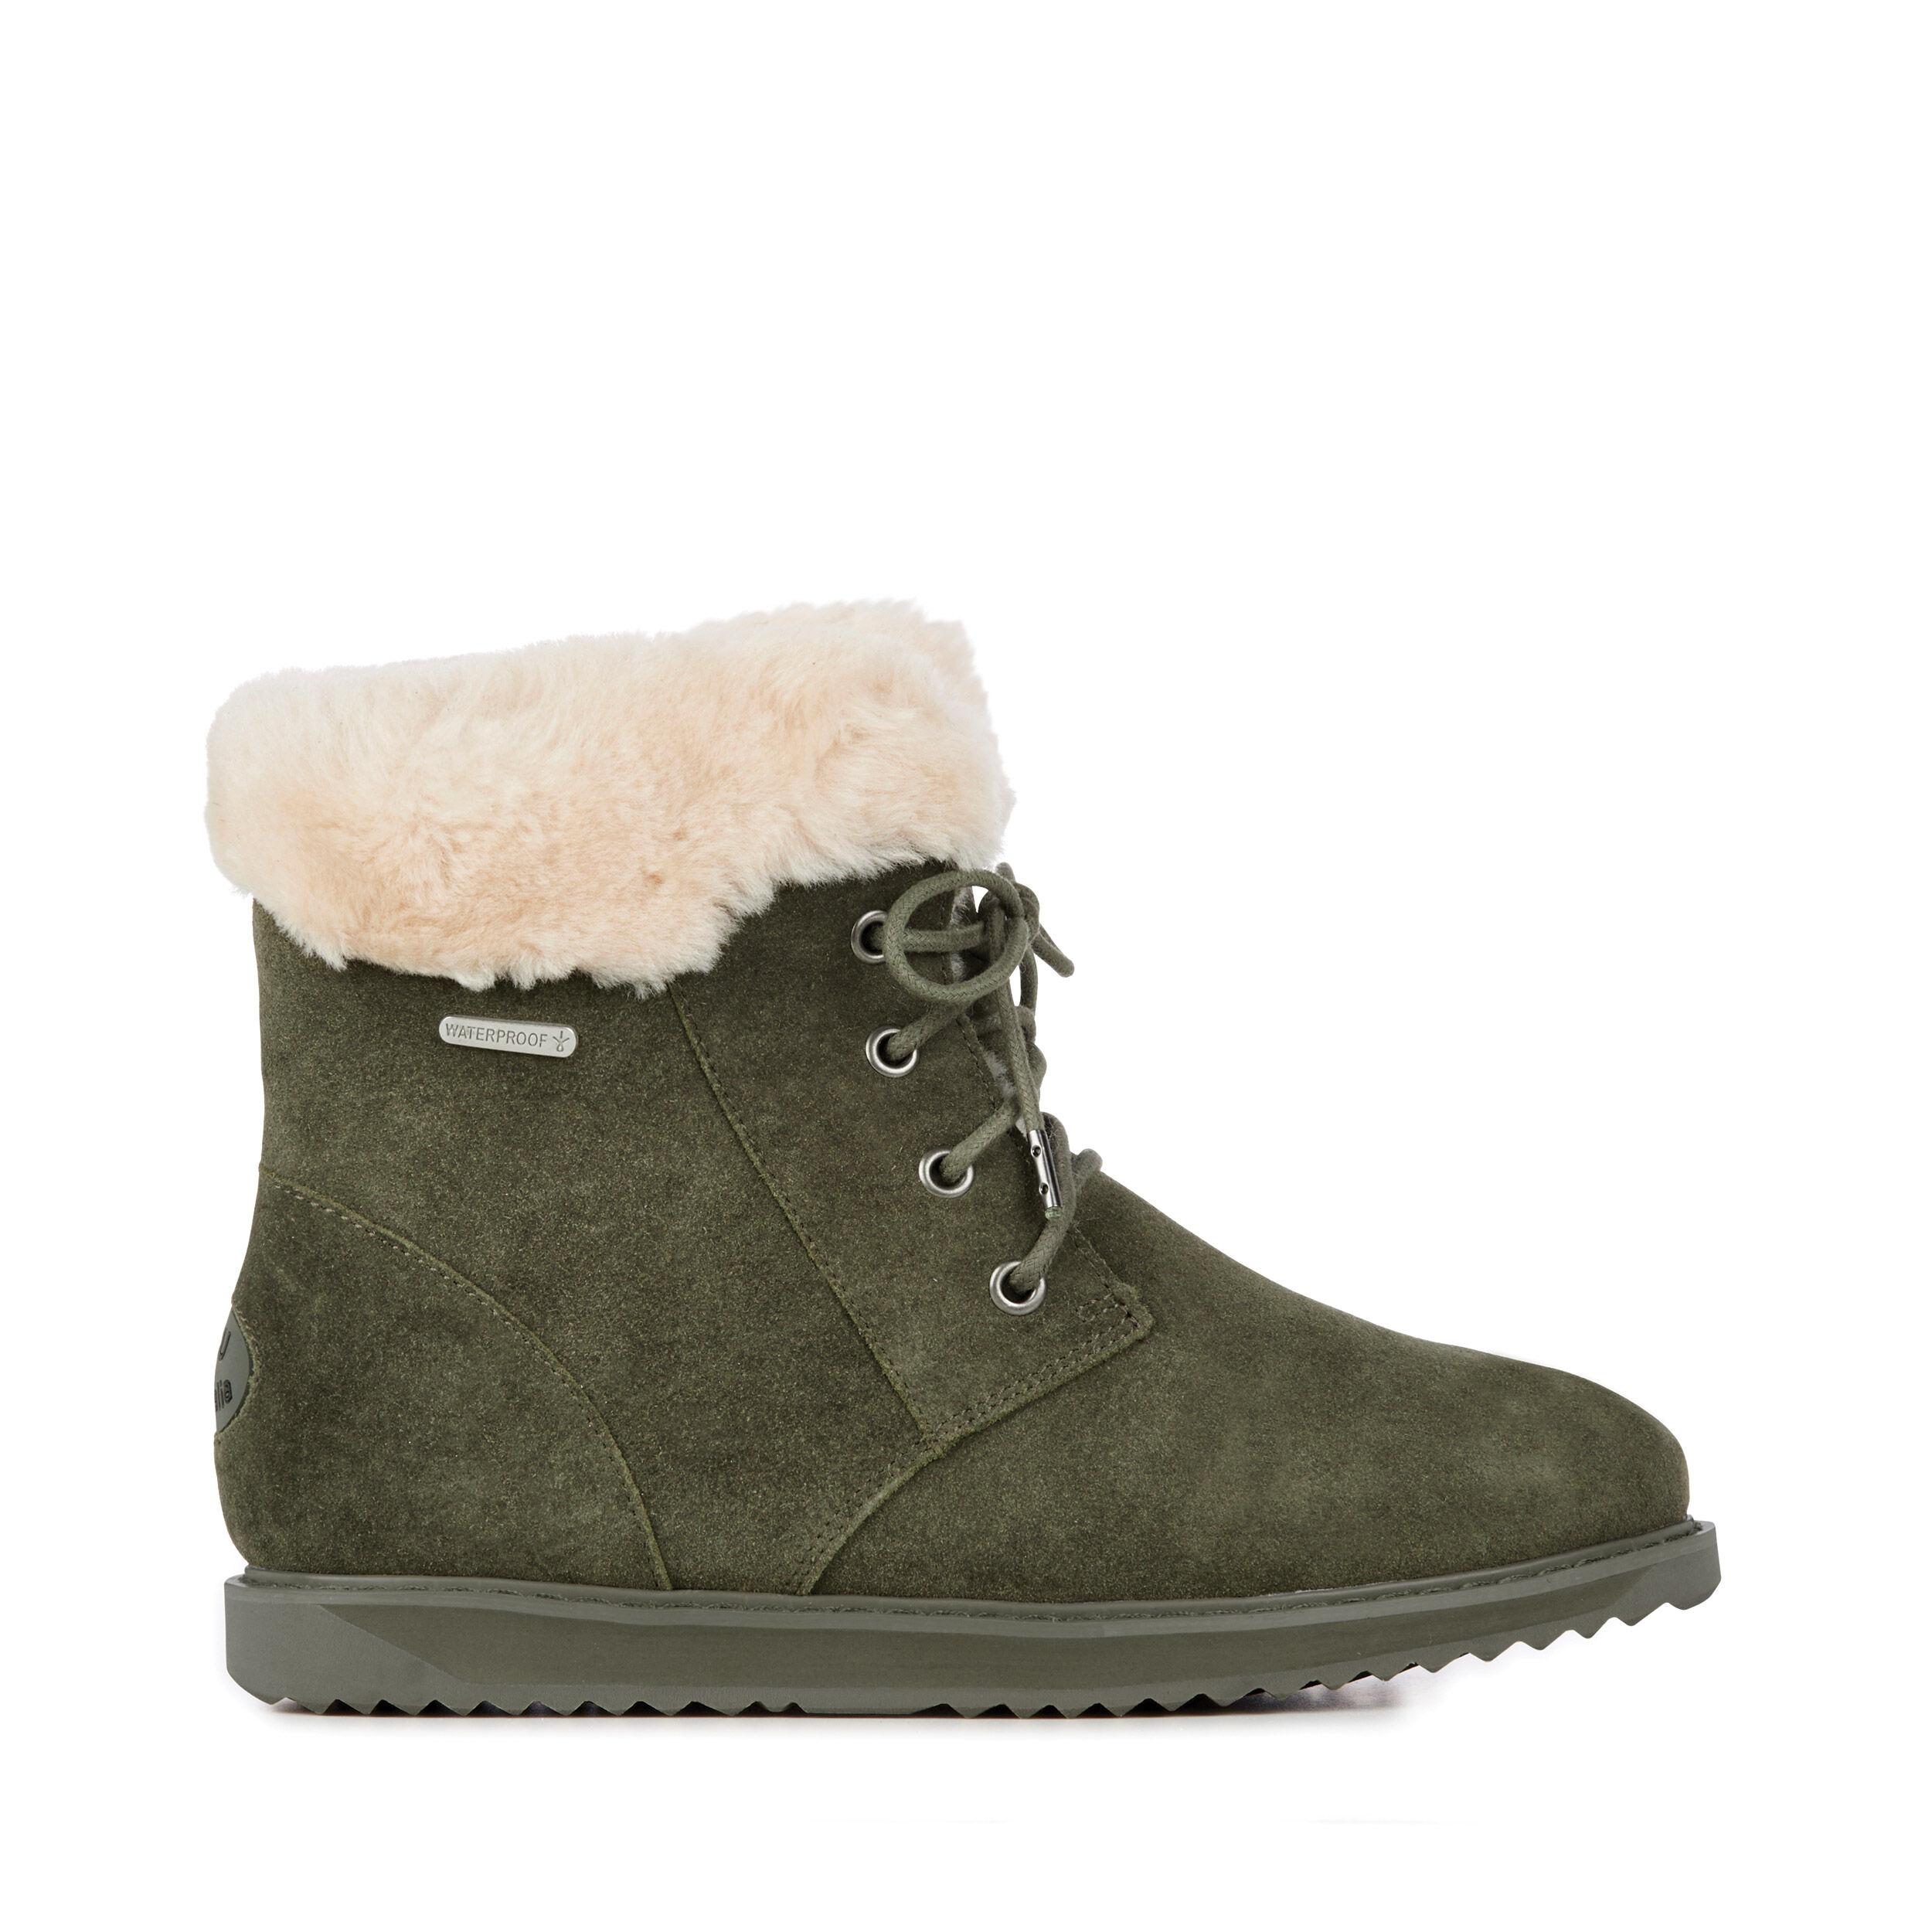 Womens Liner Skin Boot- EMU Australia